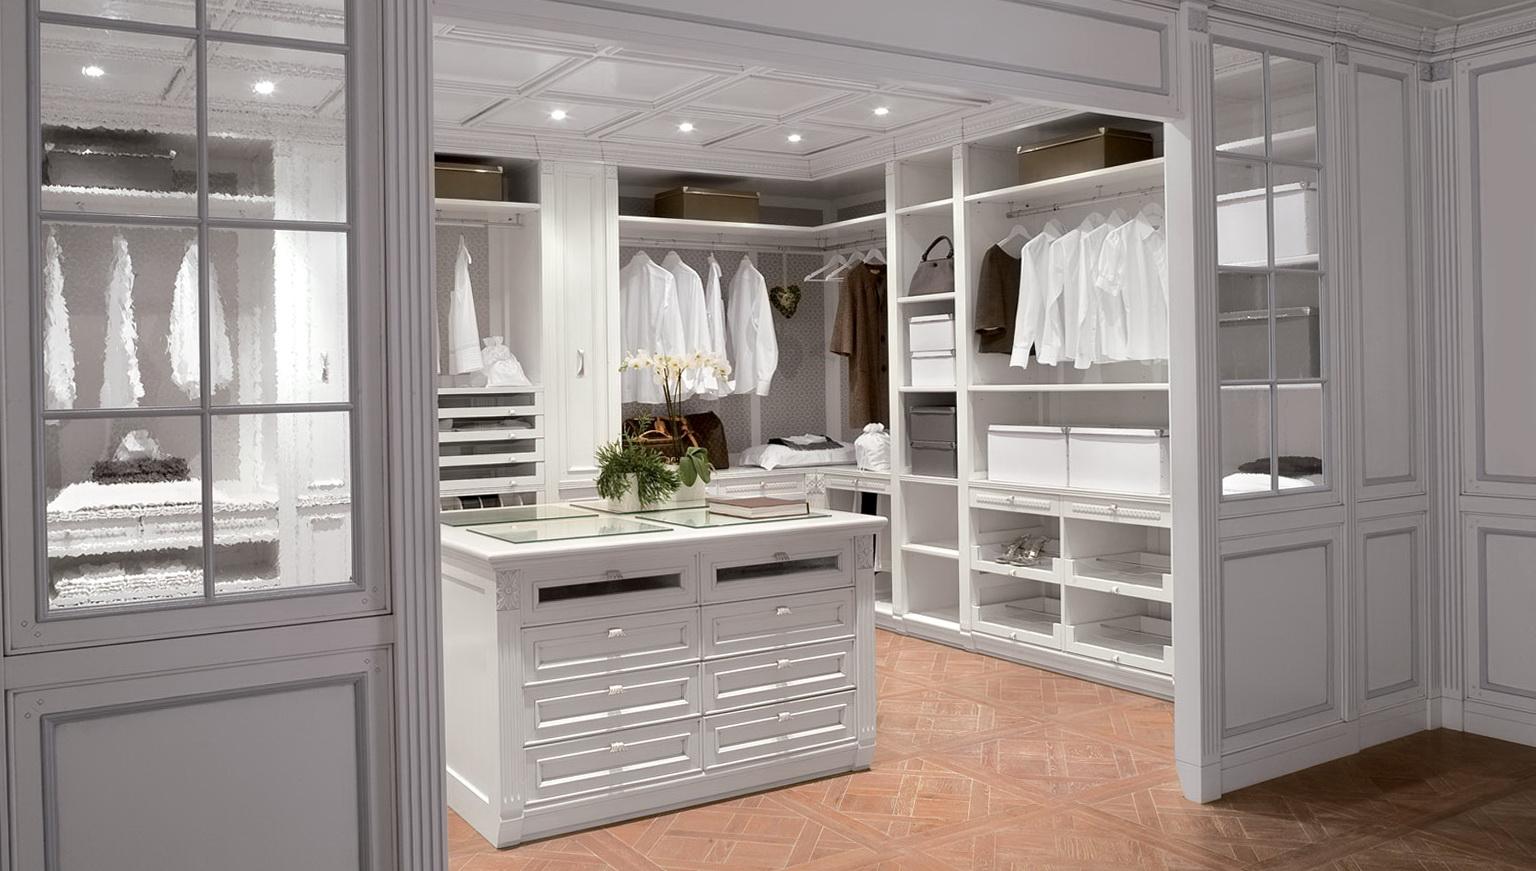 Large Tie Racks For Closets Home Design Ideas